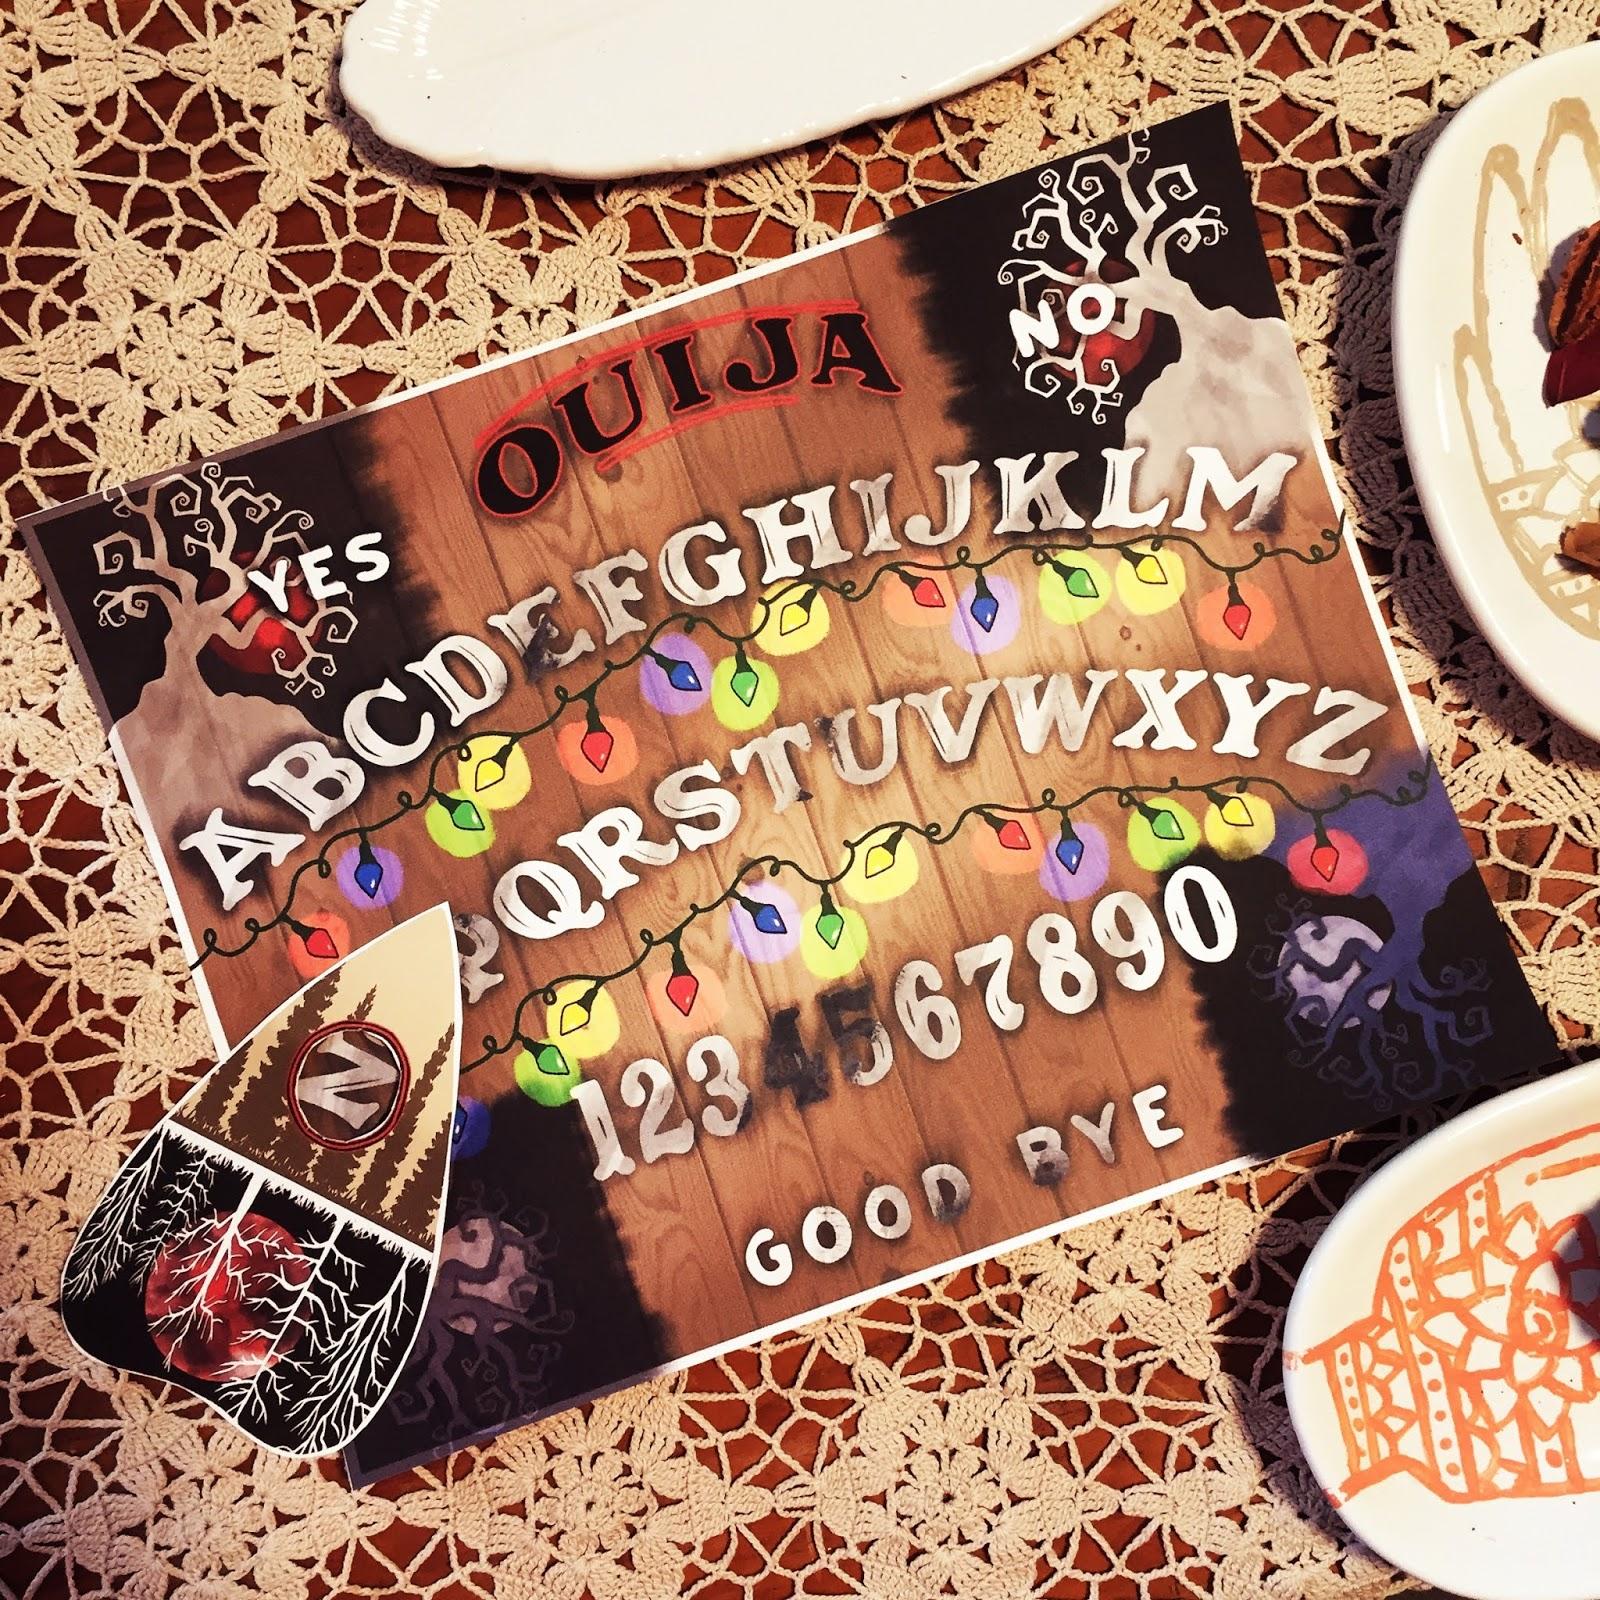 photo regarding Ouija Board Printable called Grimdol Acceptable: No cost Stranger Variables Printable Ouija Board and